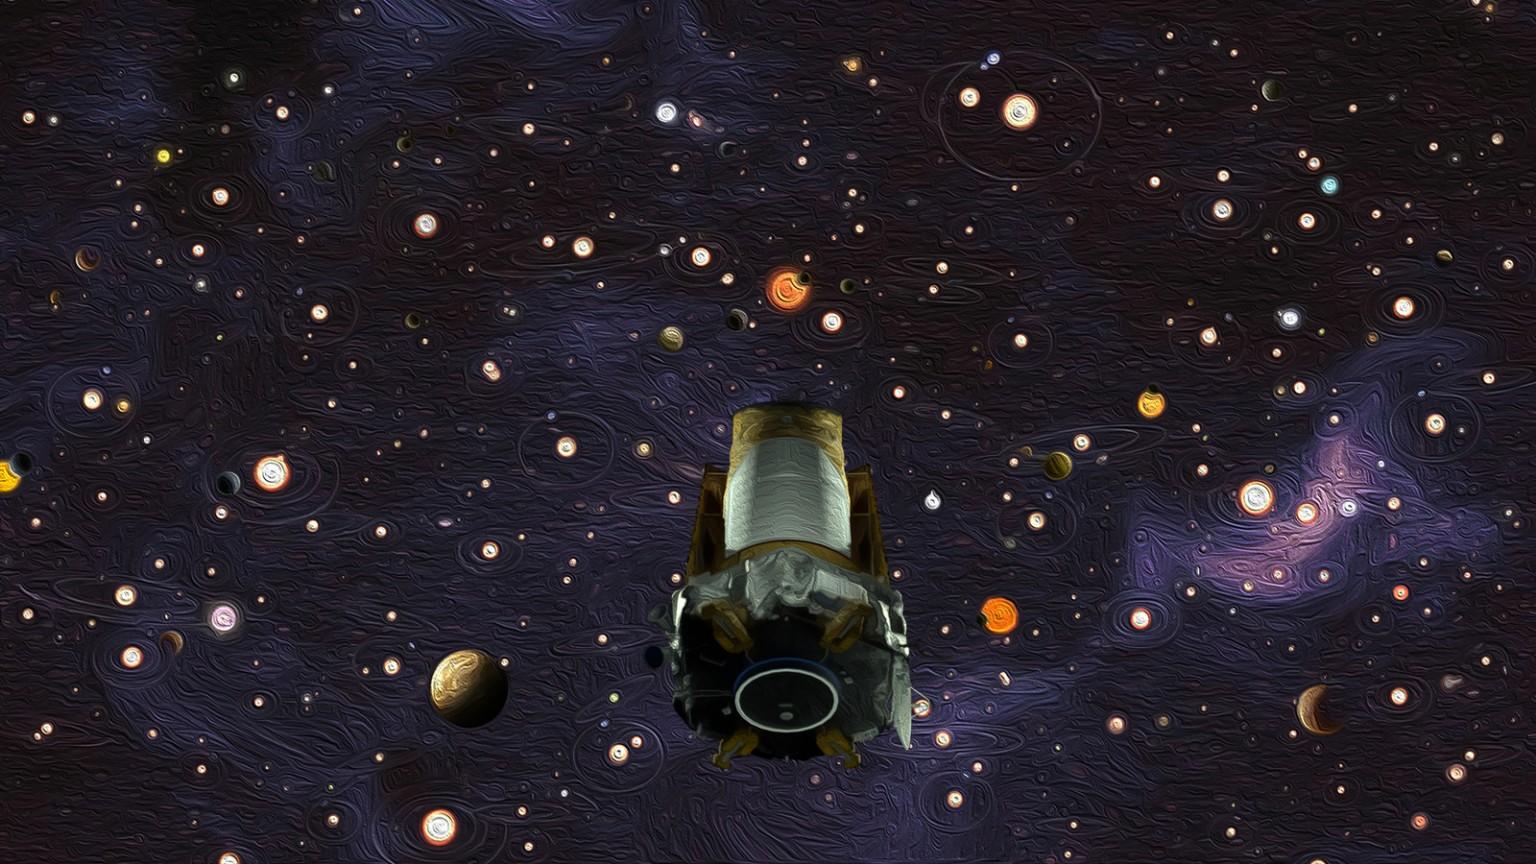 kepler spacecraft location - HD1536×864